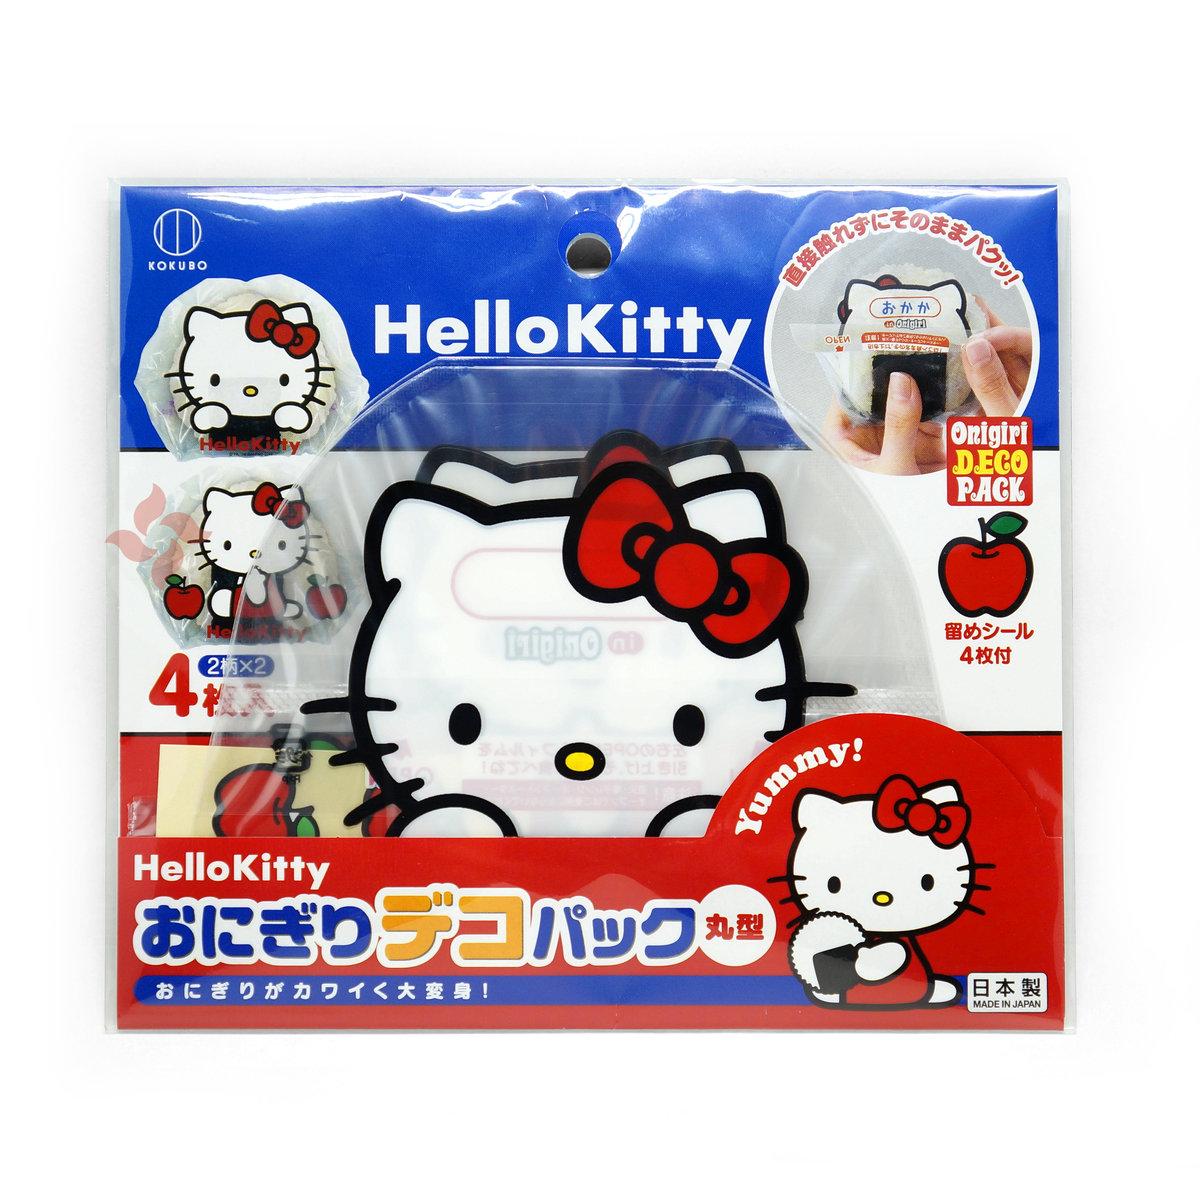 Rice ball bagx4pcs - Hello Kitty (4956810803729)